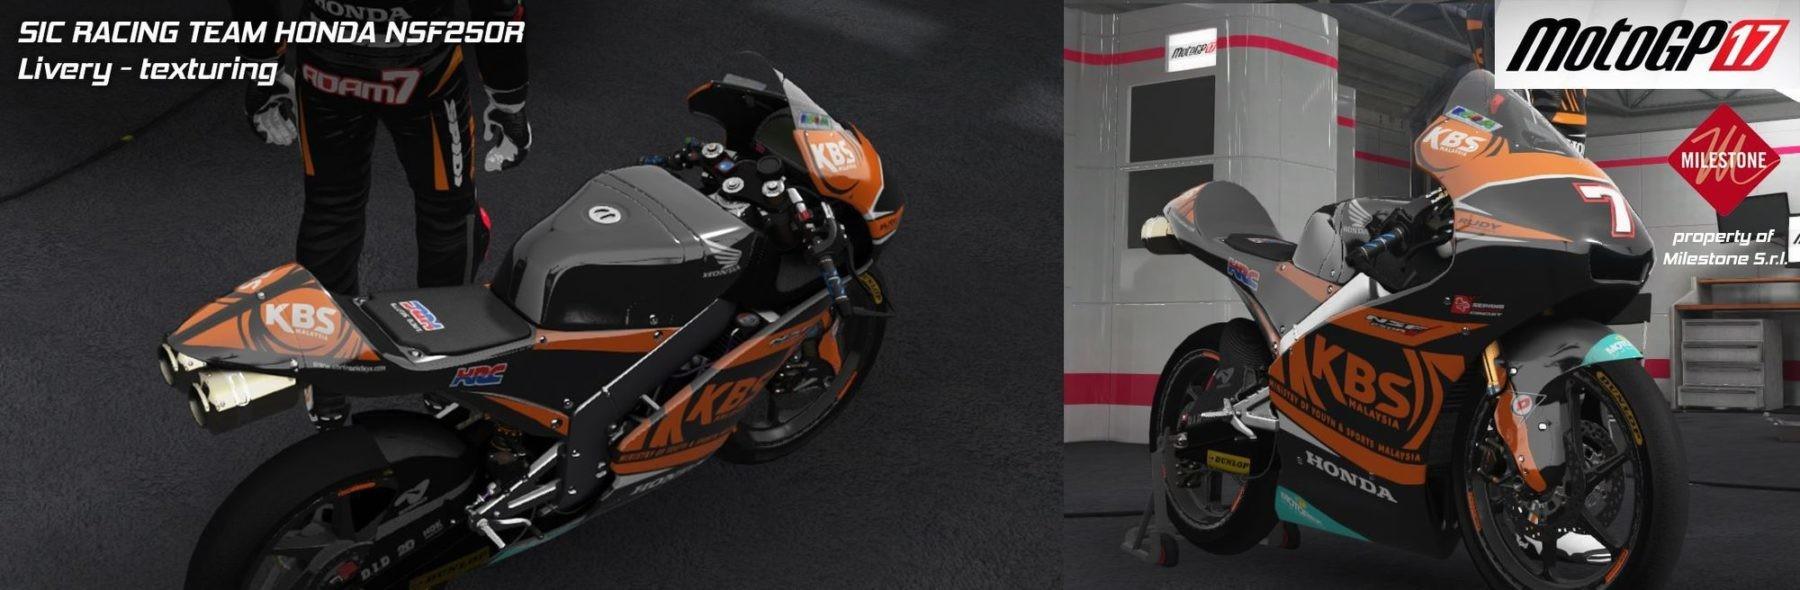 Attila gallik sic racing 1800x590